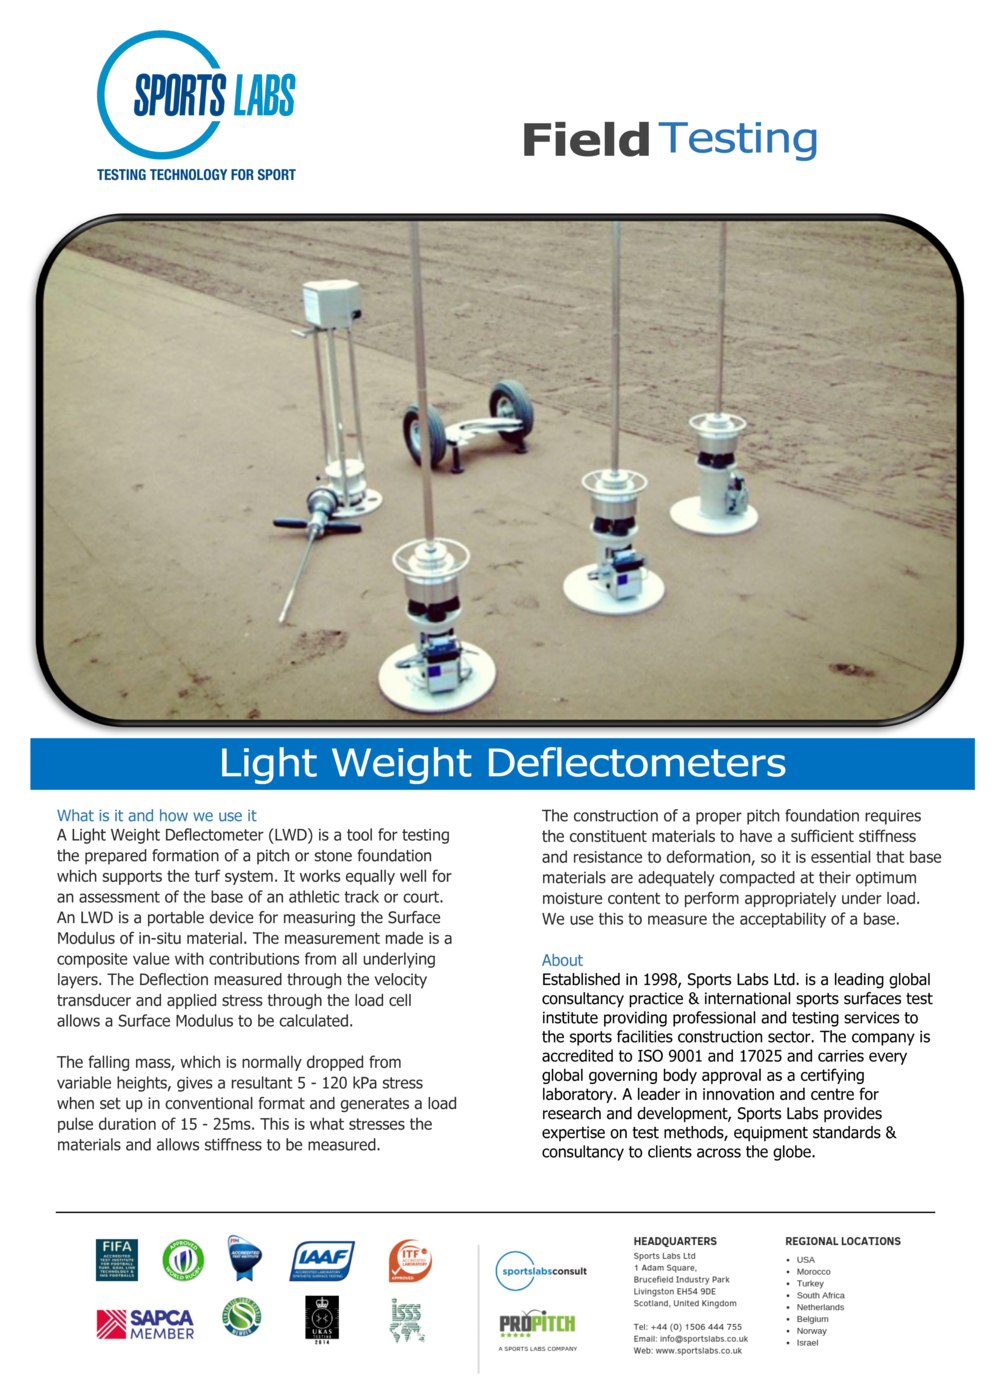 LightWeightDeflectometers.SportsLabs.png